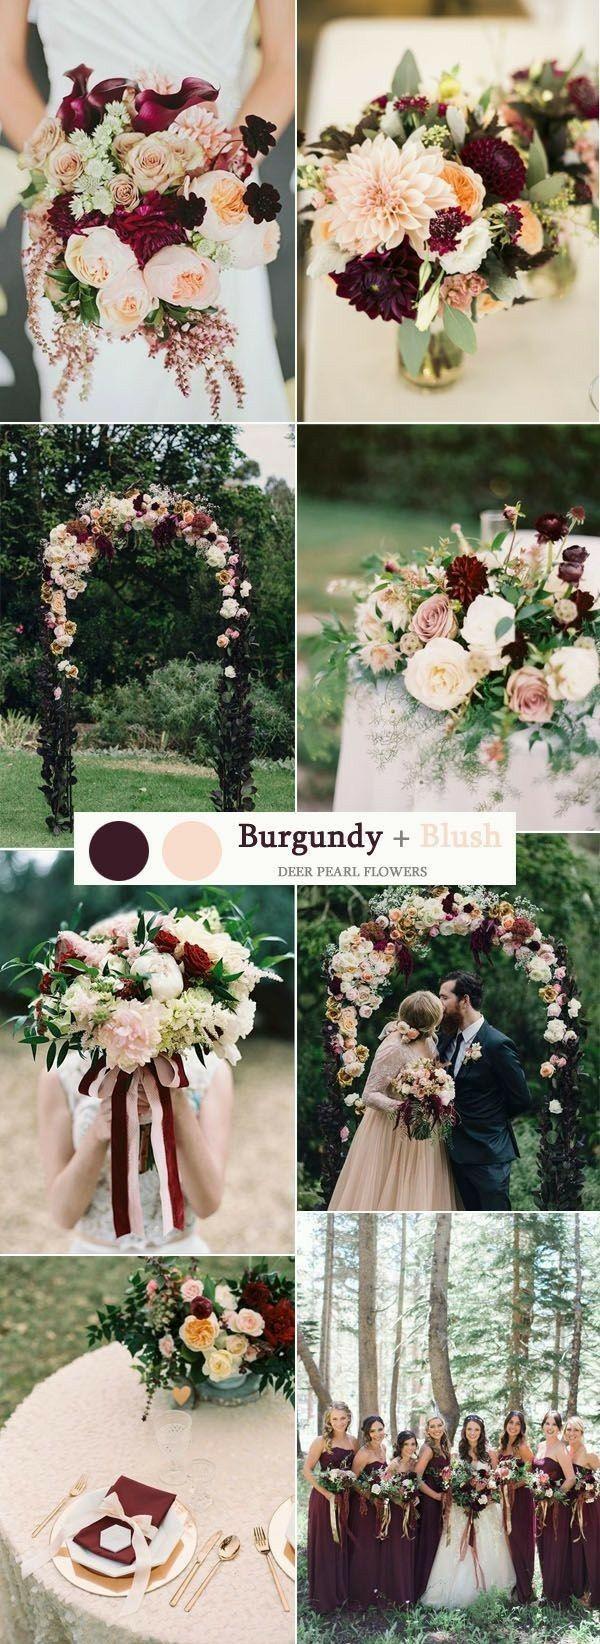 Wedding decorations yellow november 2018  best Wedding flowers images on Pinterest  Wedding ideas